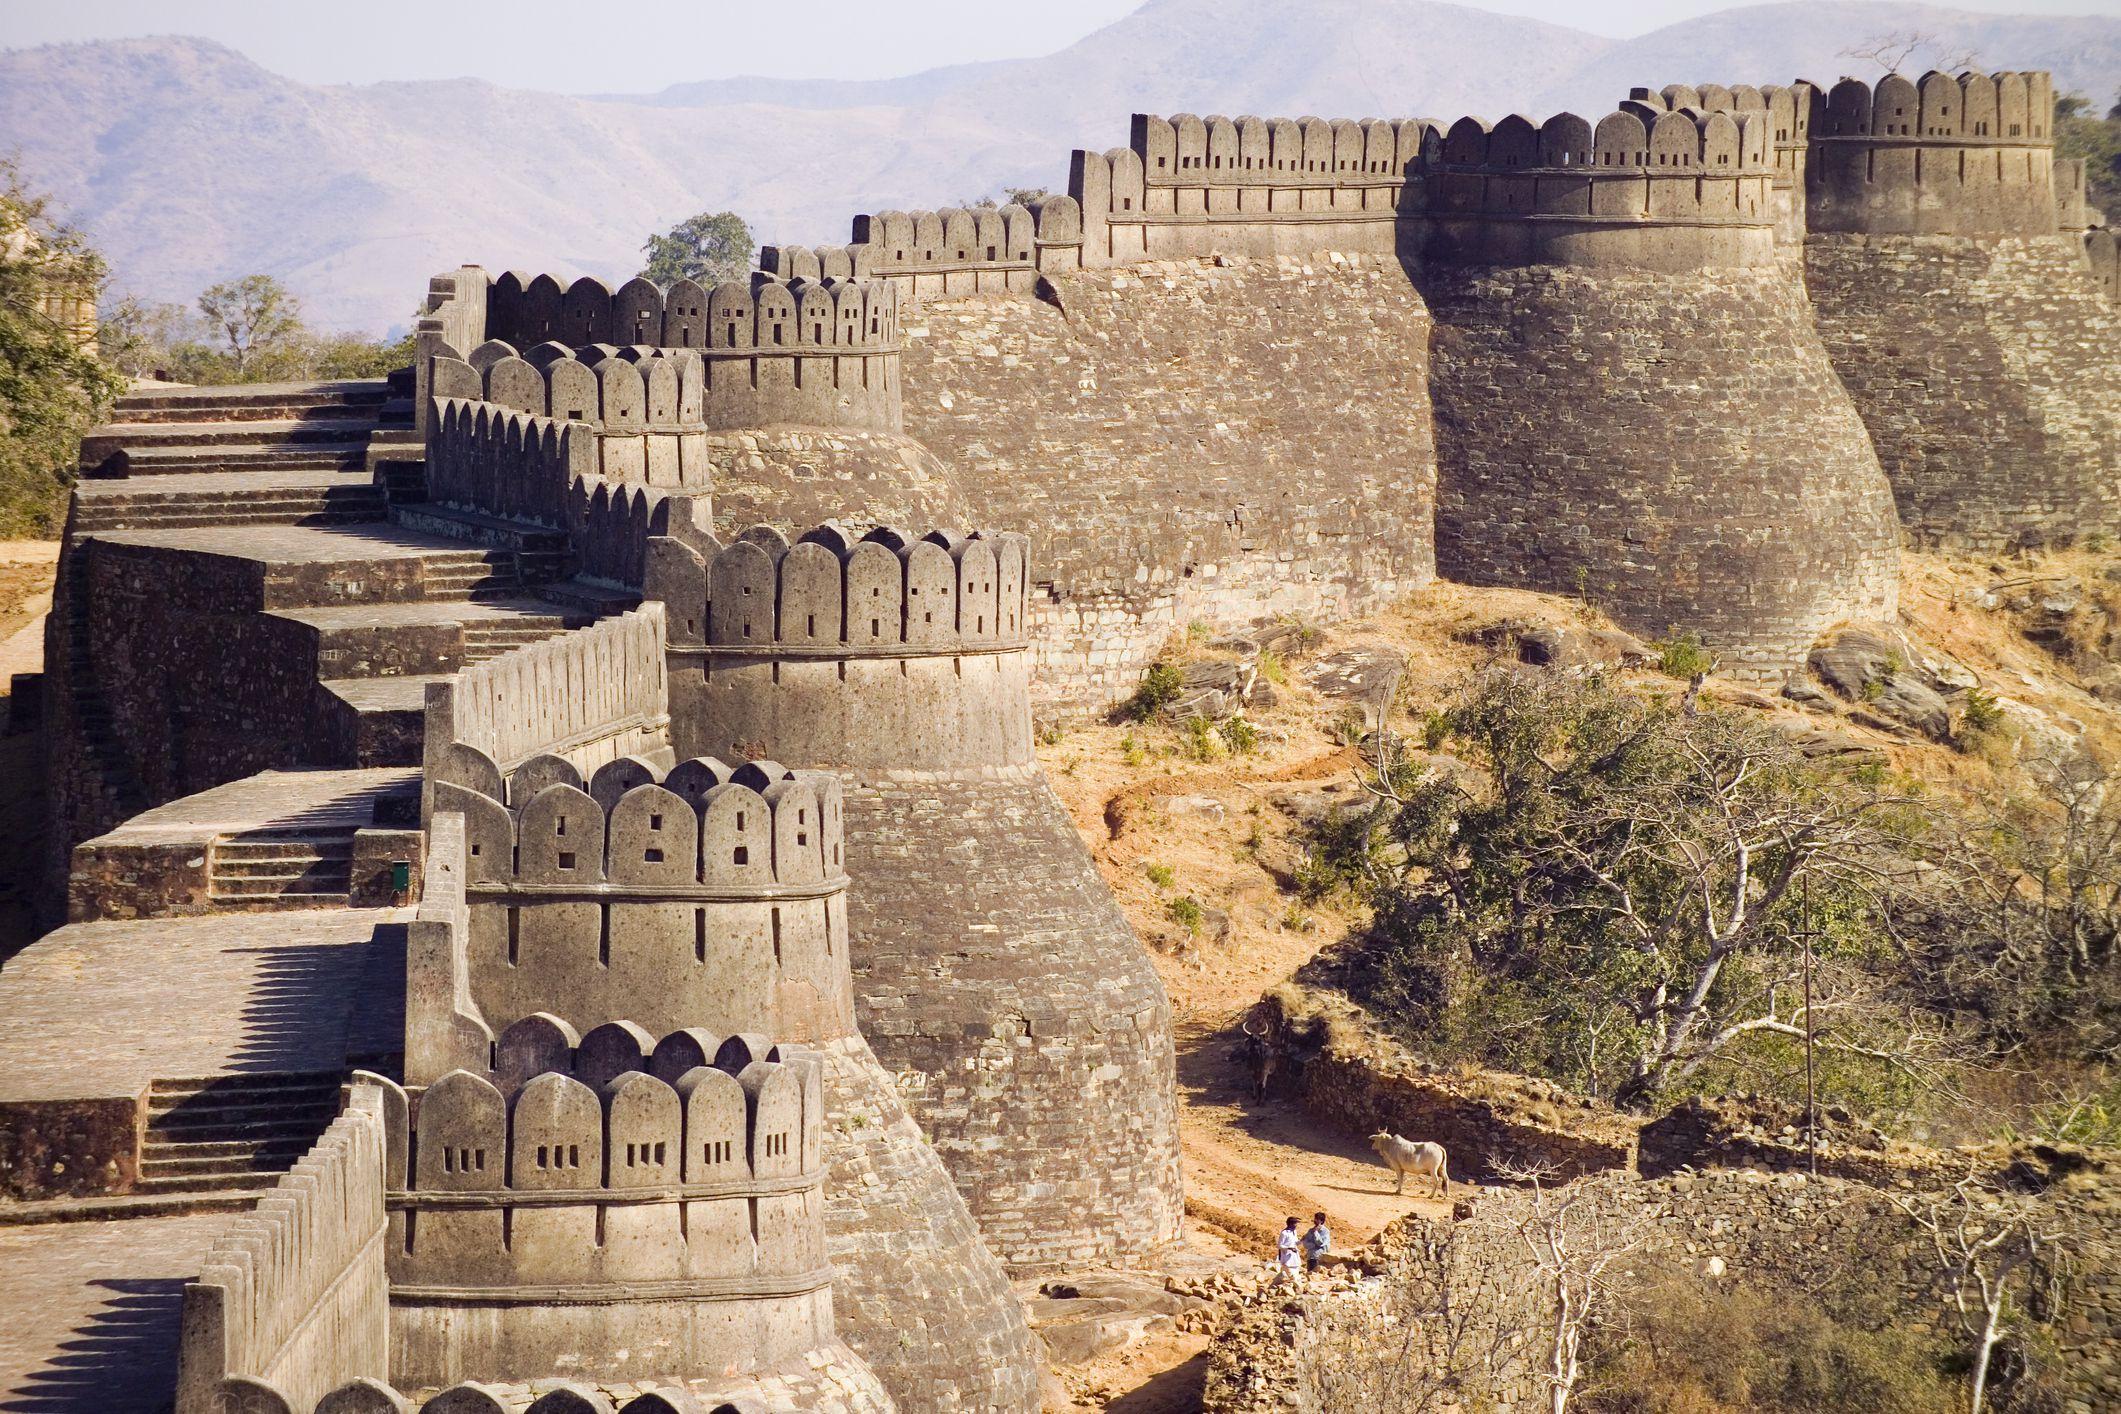 Kumbhalgarh stěny.